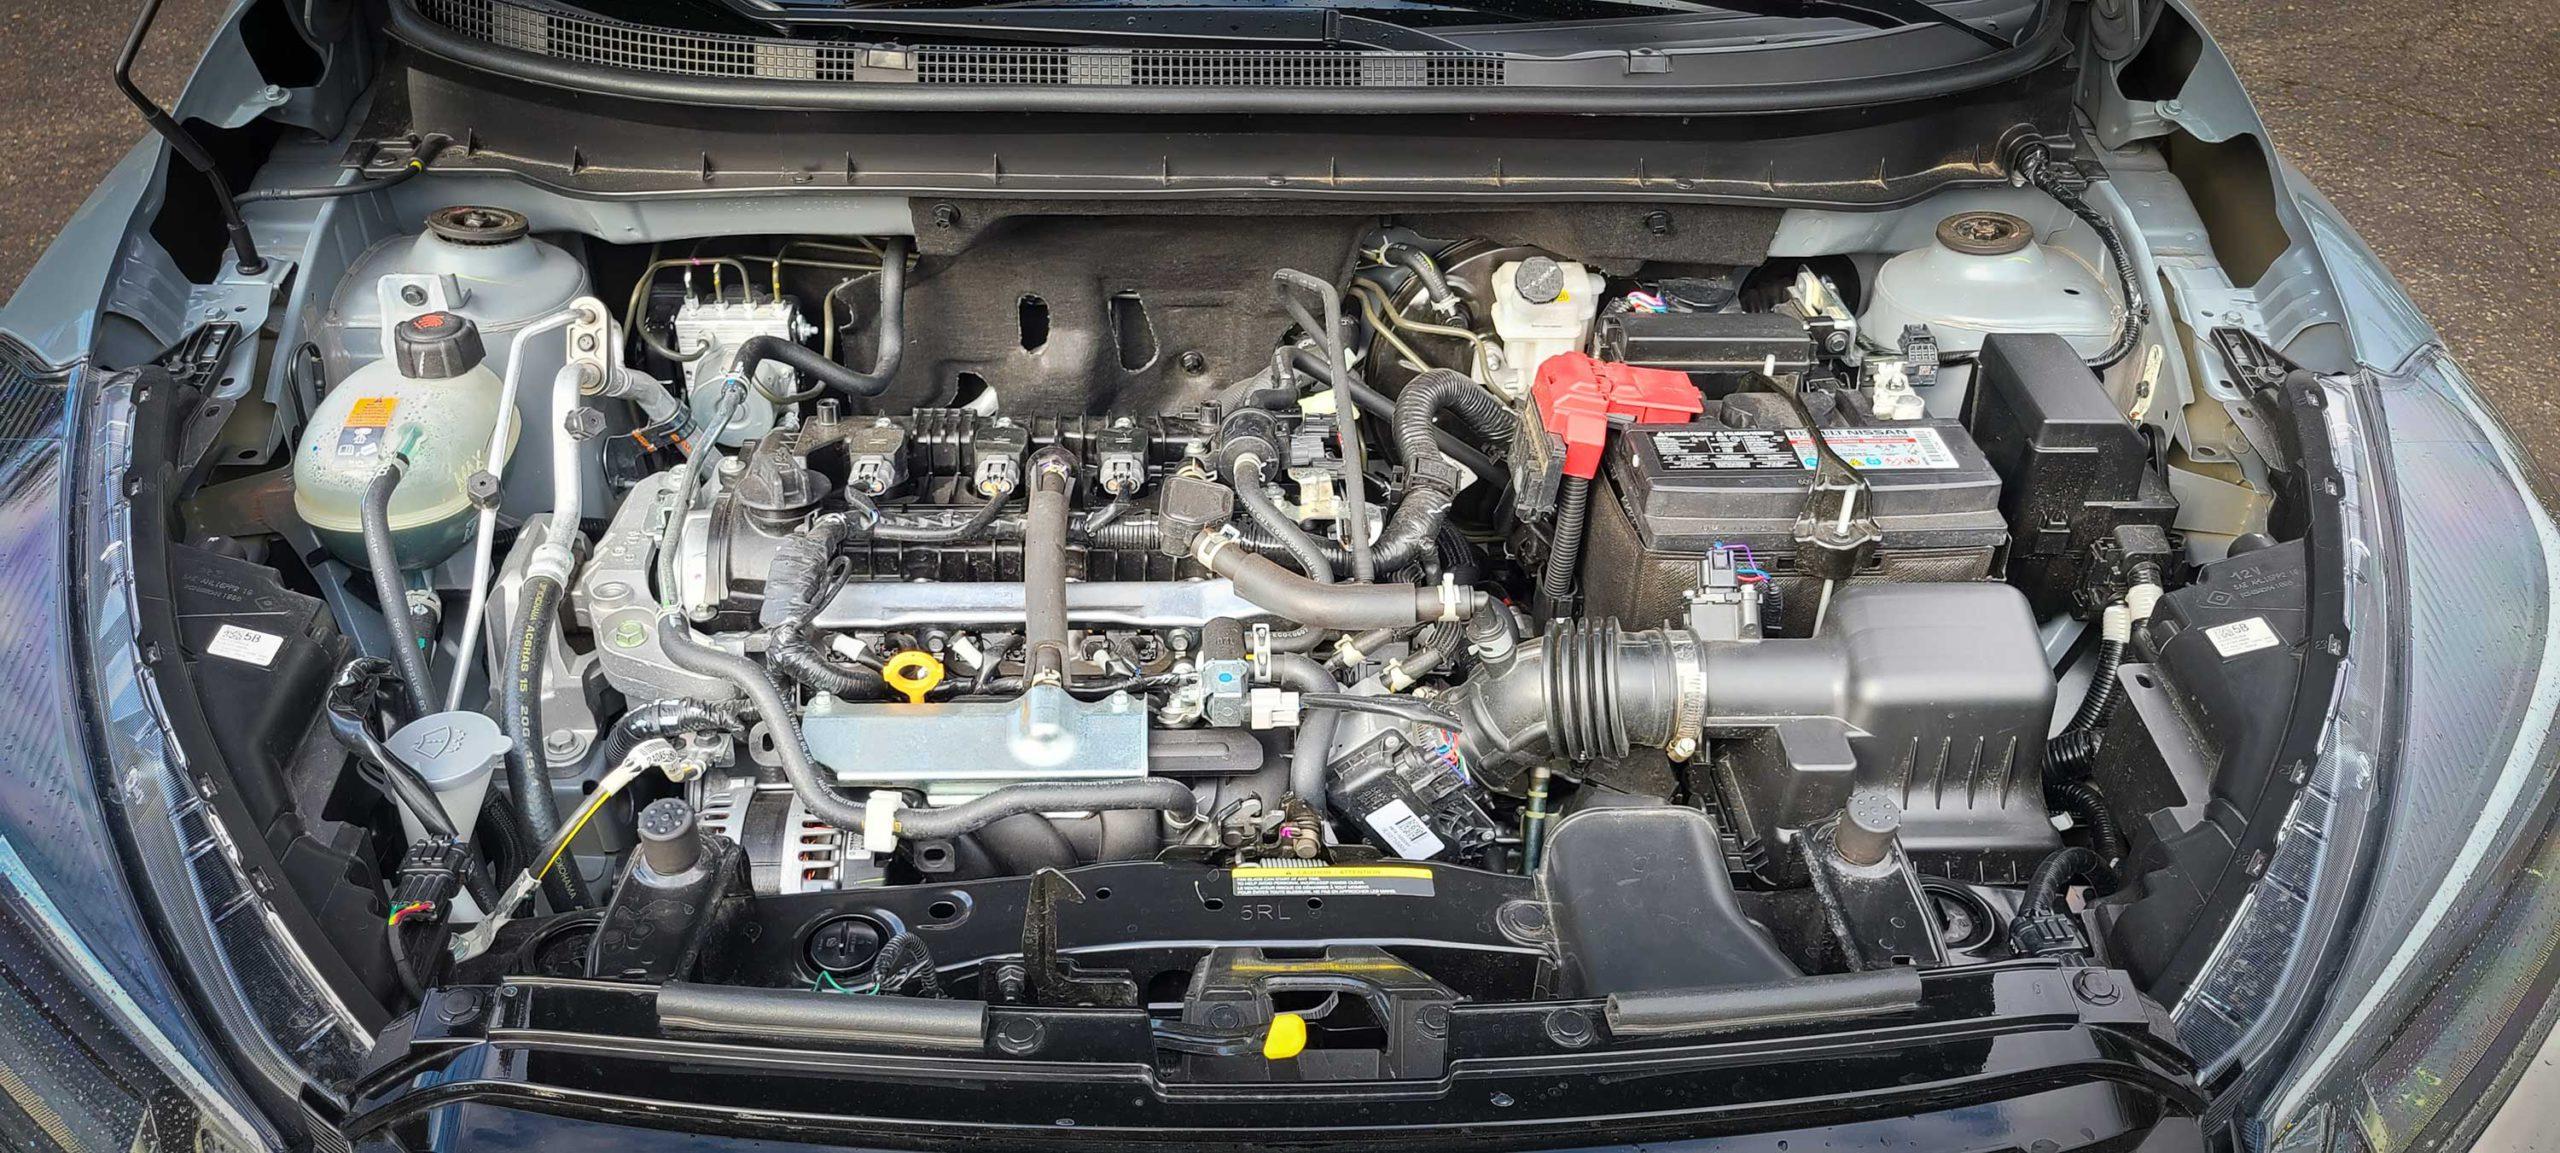 2021 Nissan Kicks Engine Bay